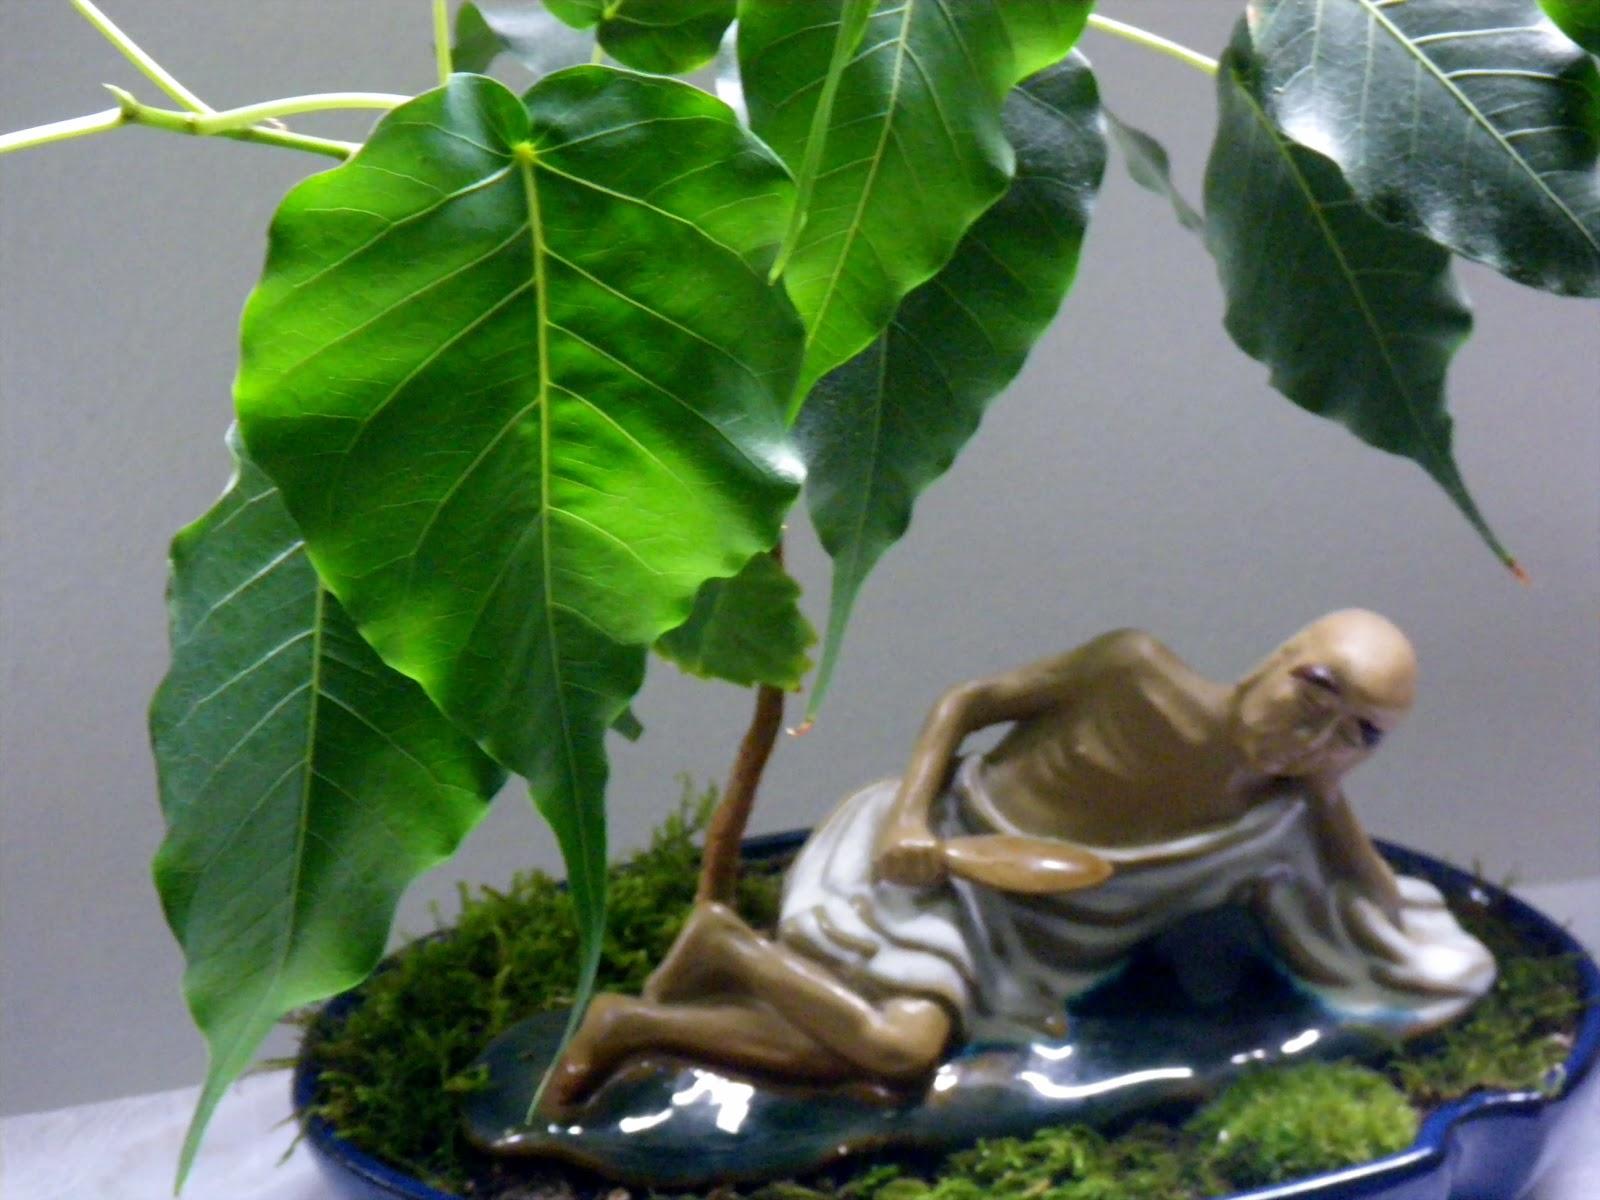 Scented Leaf Ficus Religiosa Bonsai